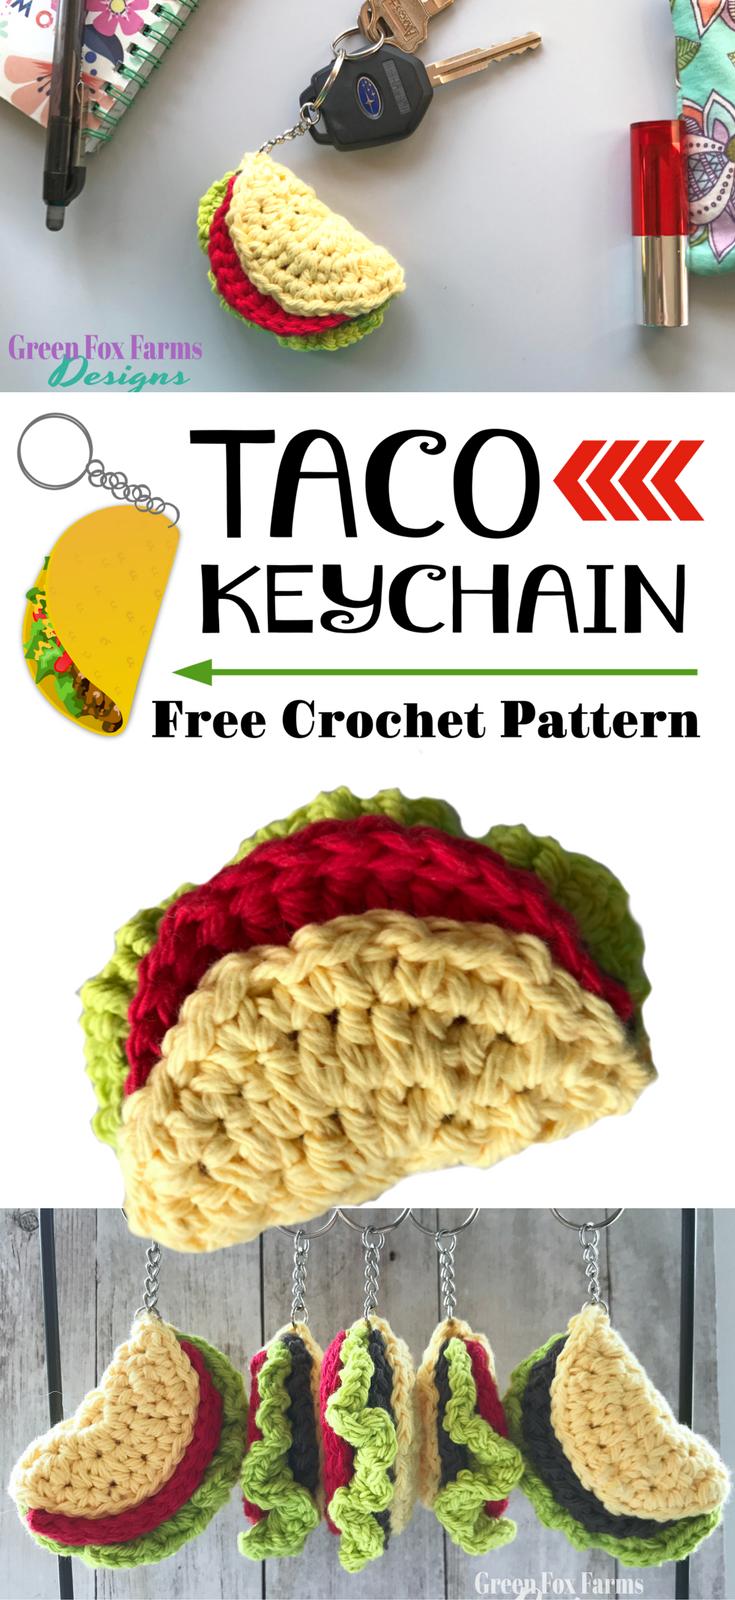 Taco keychain free crochet pattern crochet taco crochet food taco keychain free crochet pattern crochet taco crochet food play food bankloansurffo Choice Image